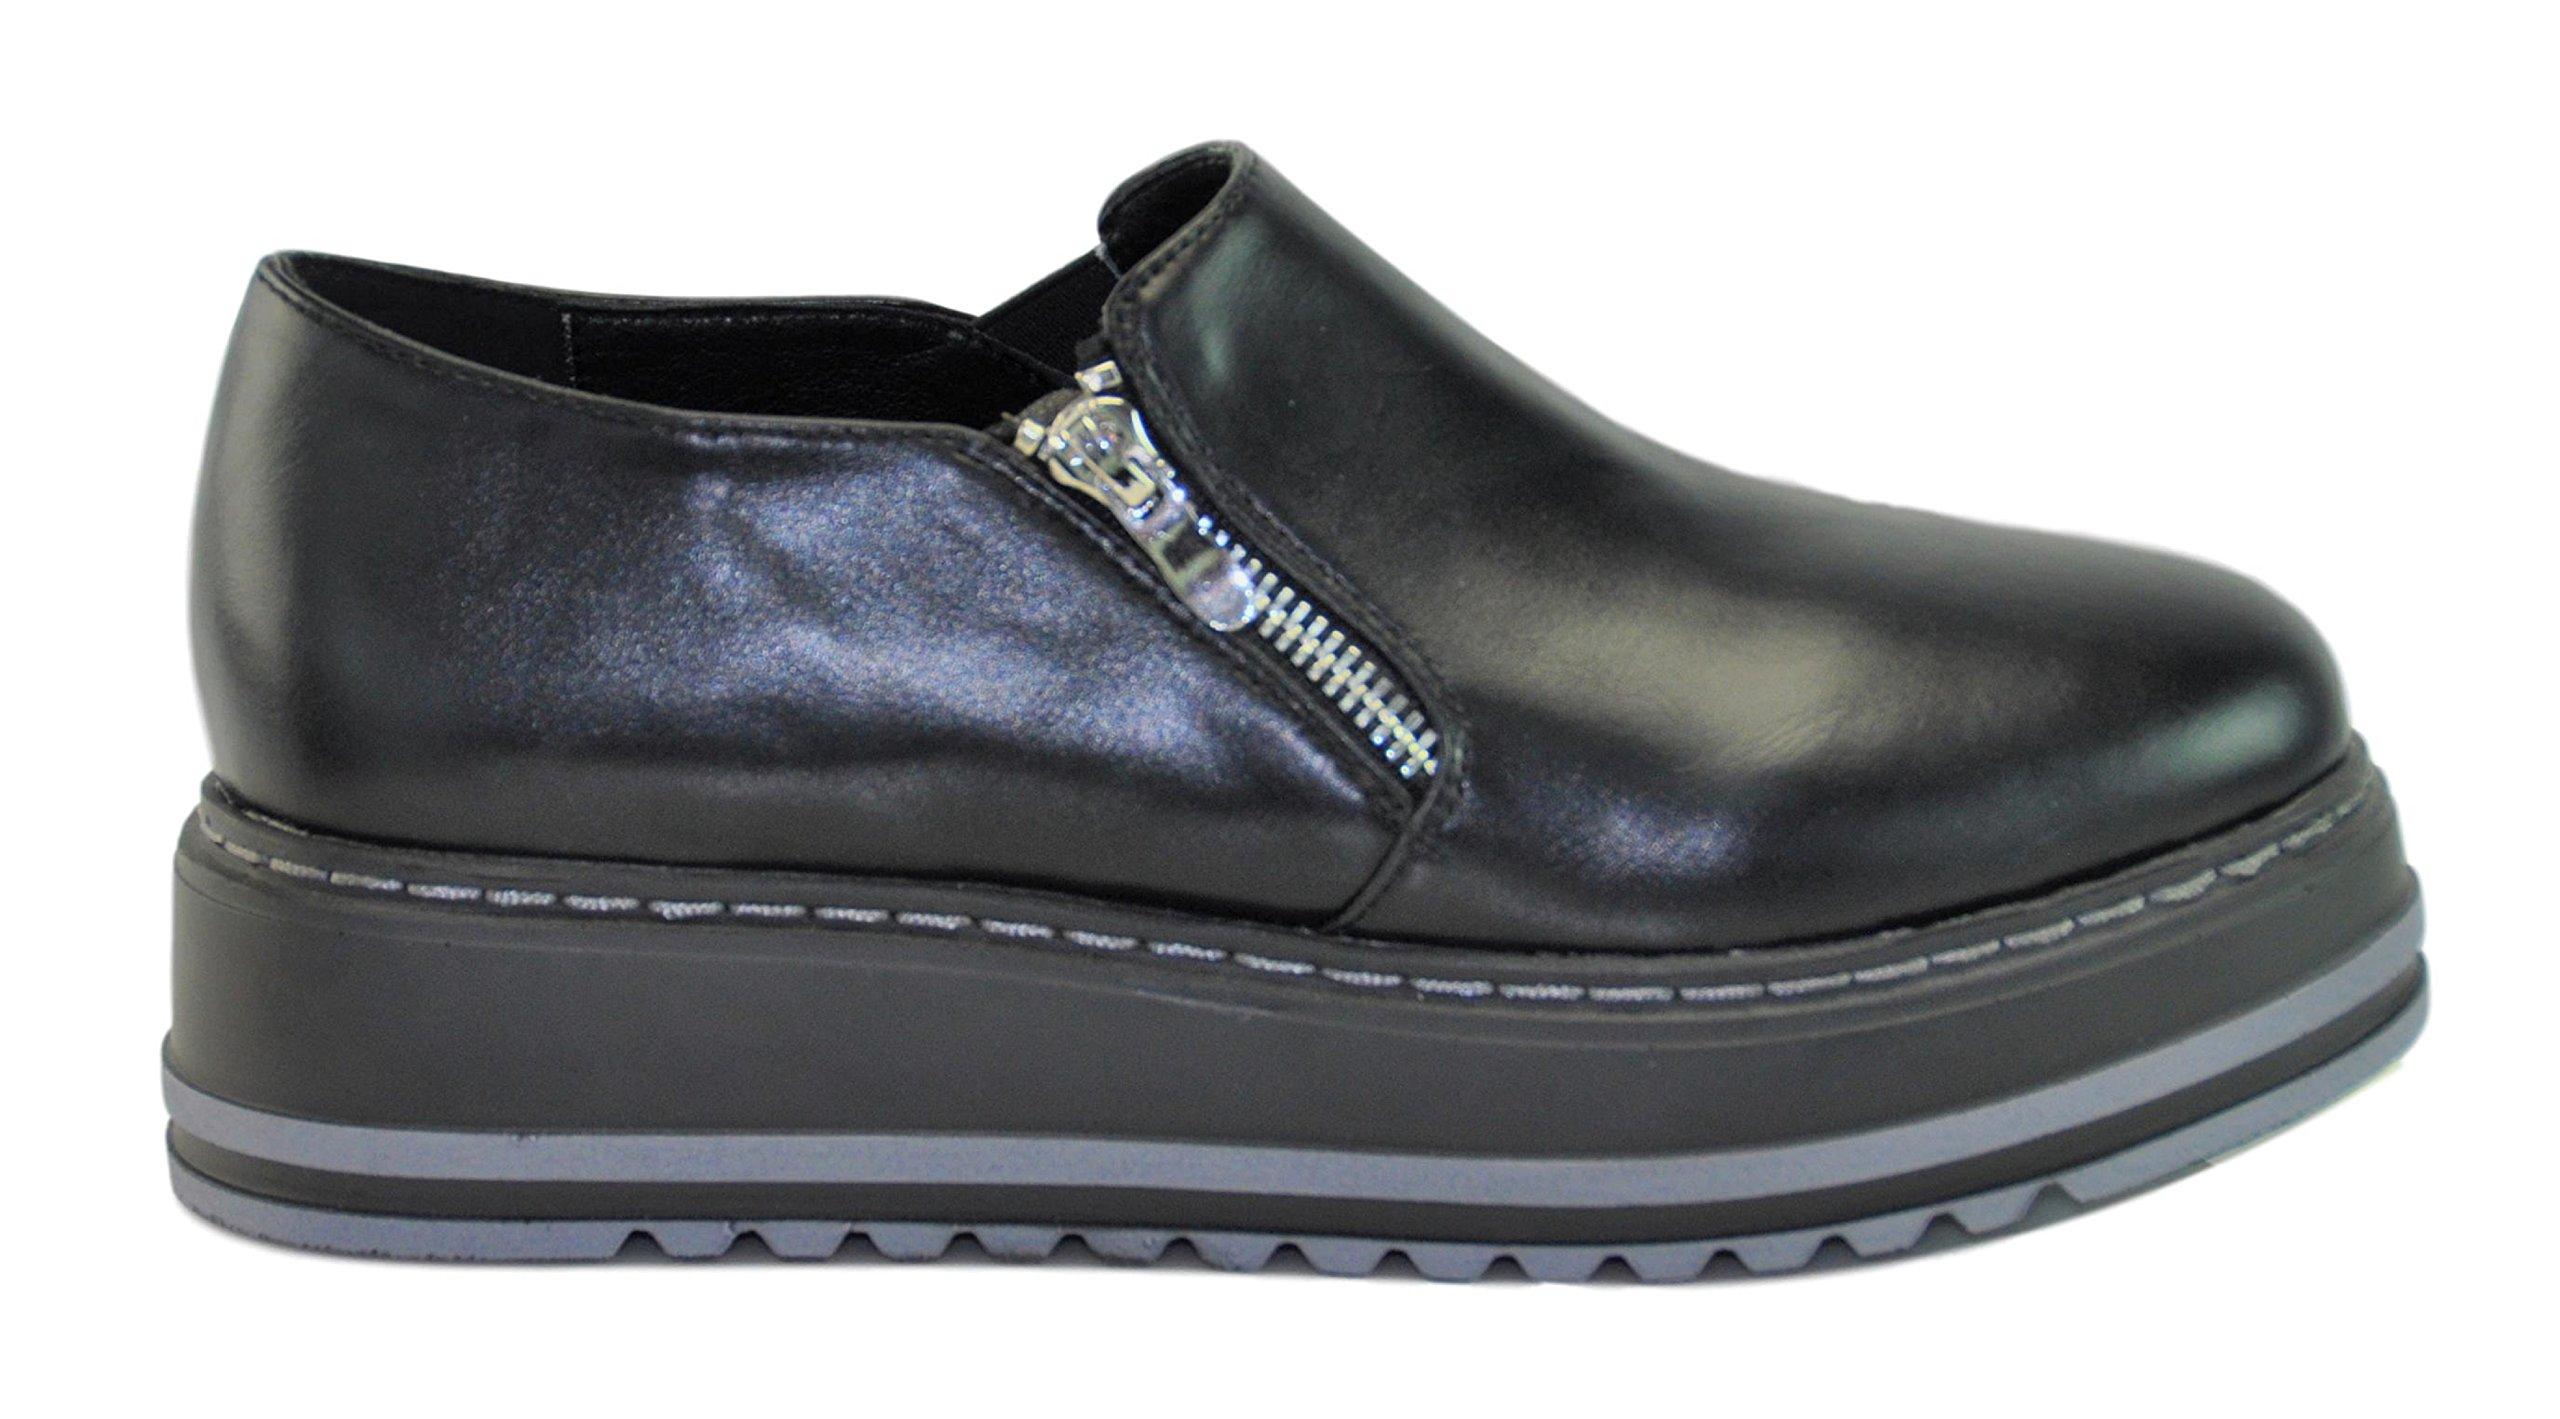 Lynda Black Quality Prime Fashion Slip On Clearance Sale High Heel Creeper Platform Wedge Summer School Oxford Zapatos de Plataforma para Ninas for Youth Teen Girls Women Mujer (Size 5.5, Black) by BDshoes (Image #2)